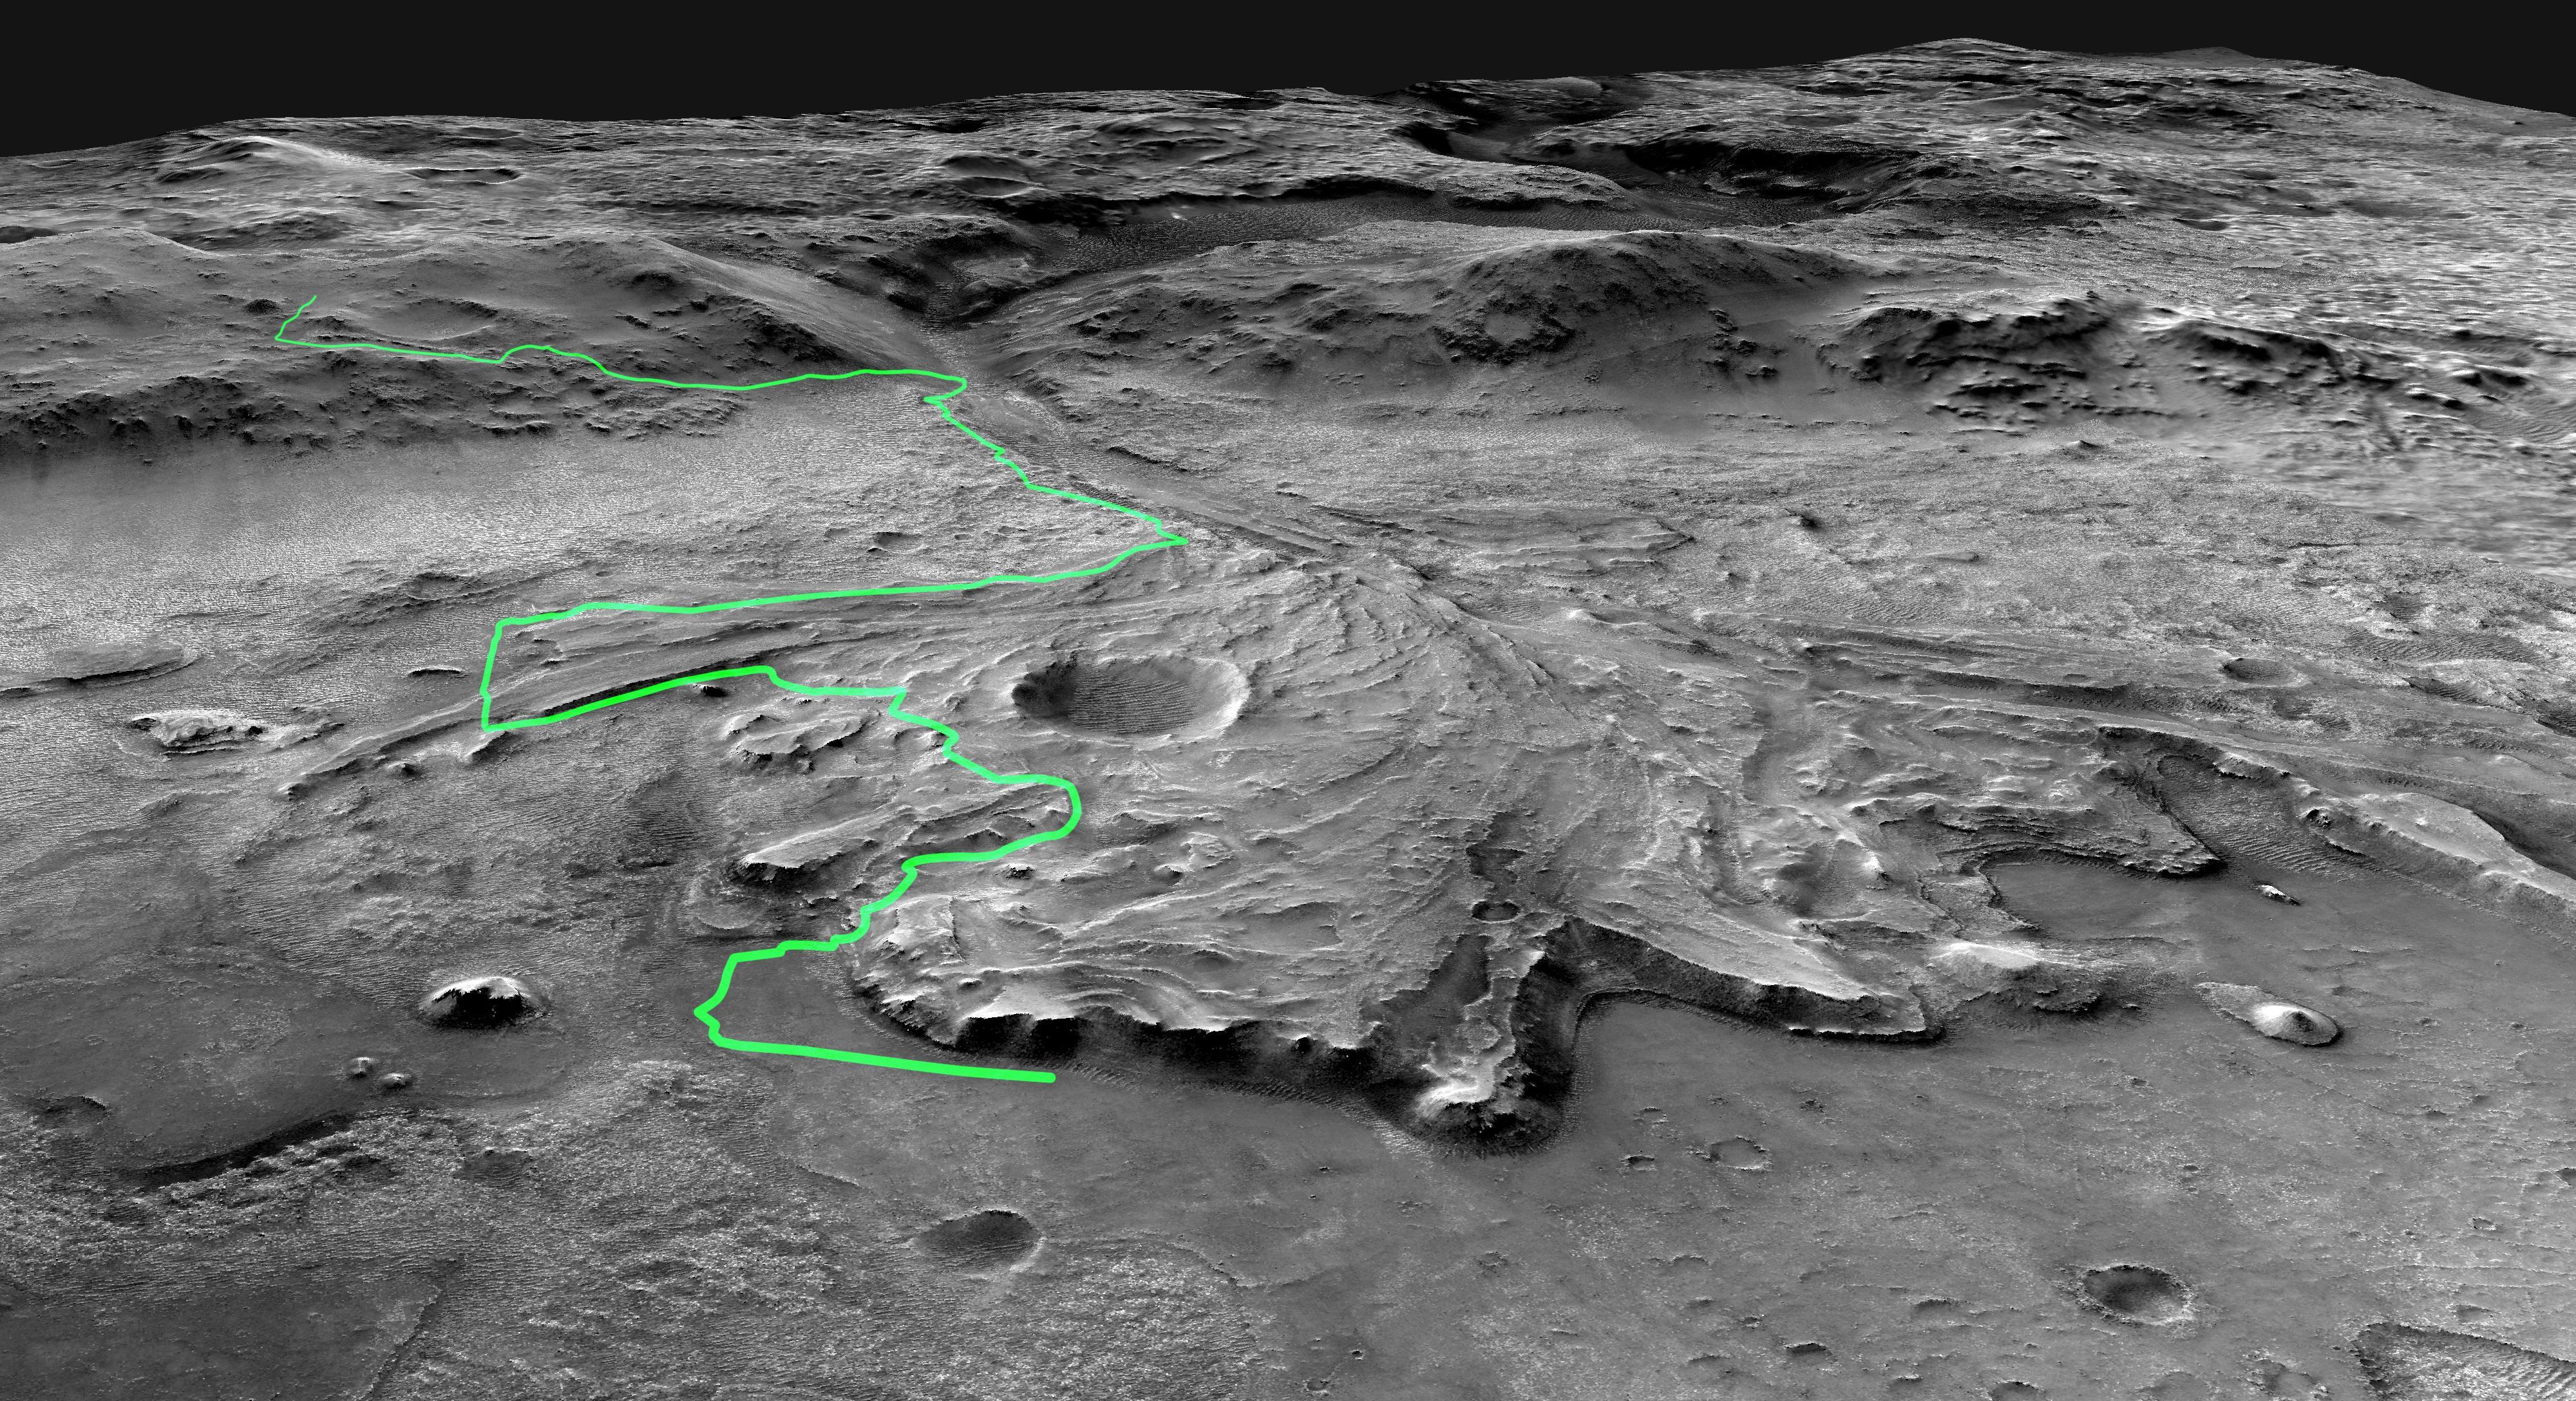 Mars 2020 (Perseverance) : voyage et atterrissage - Page 3 EudC5NfXYAIjYDi?format=jpg&name=4096x4096